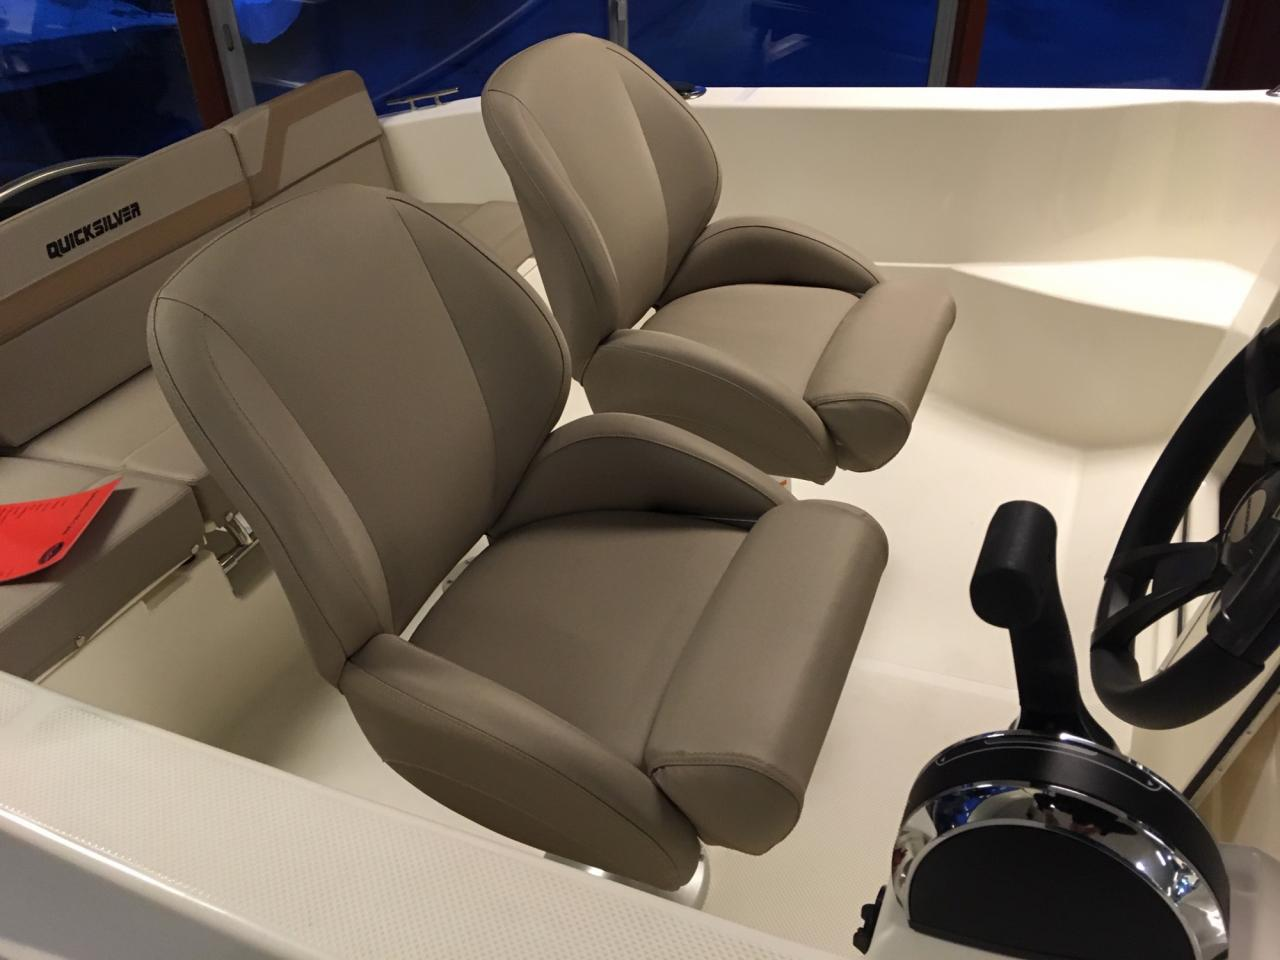 Quicksilver 455 activ cabin met Mercury 25 pk 3